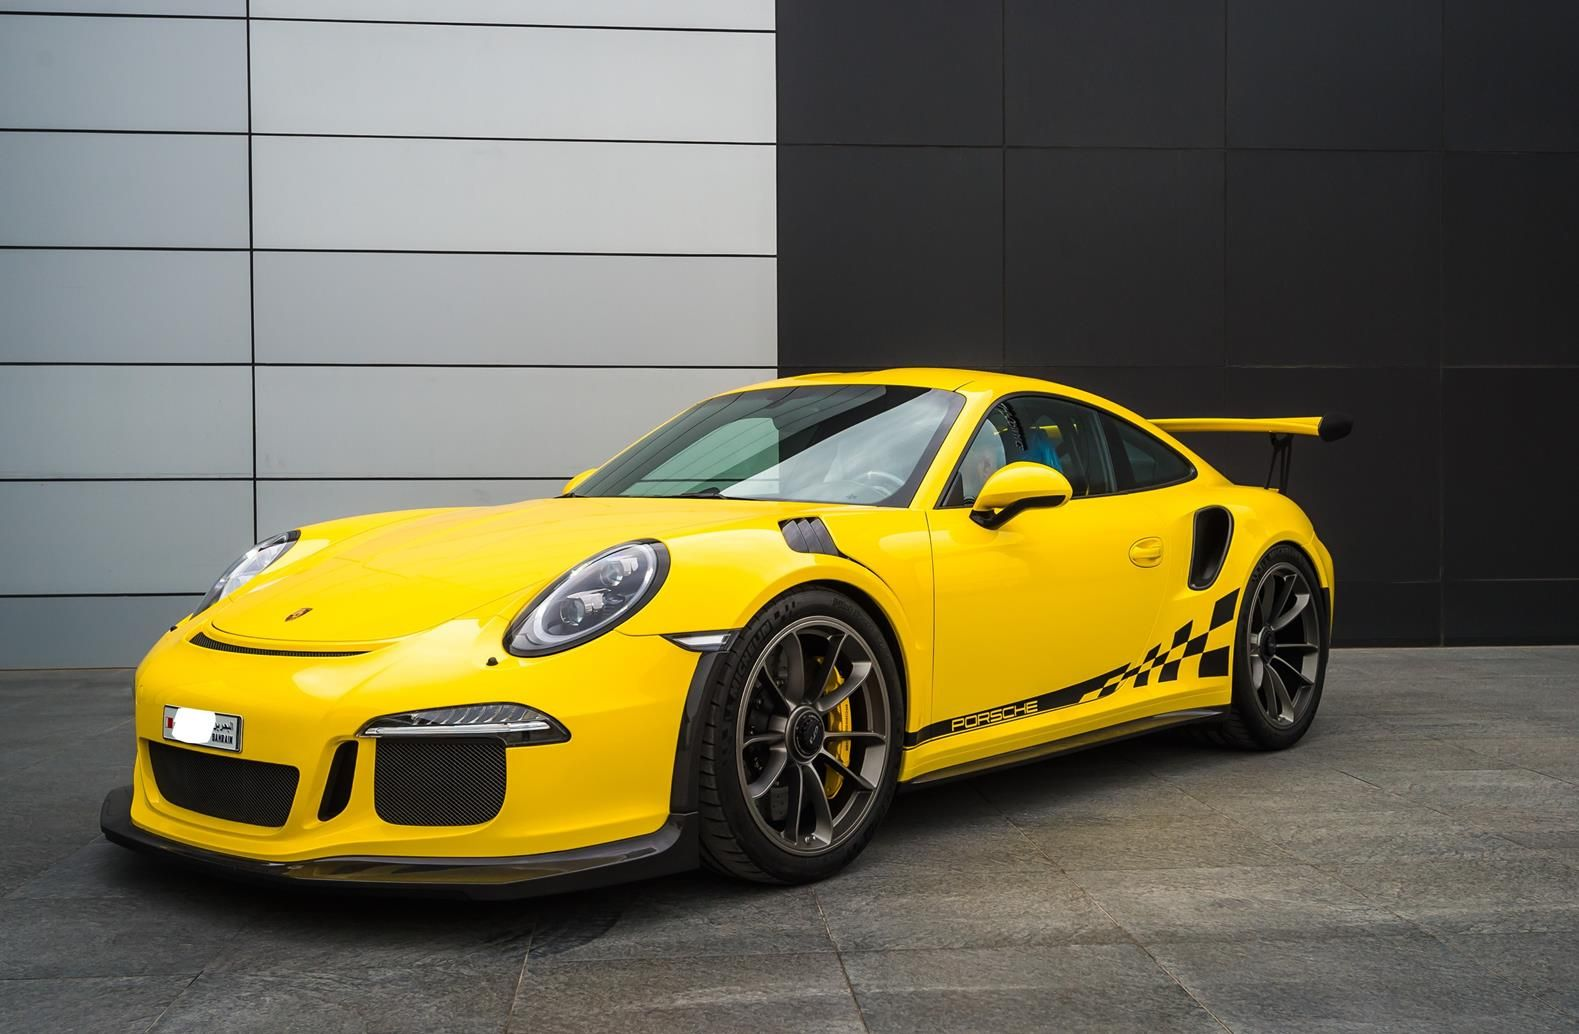 Pin By Nathan Felle On Scene Other Vehicles Porsche 911 Gt3 Porsche 911 Porsche